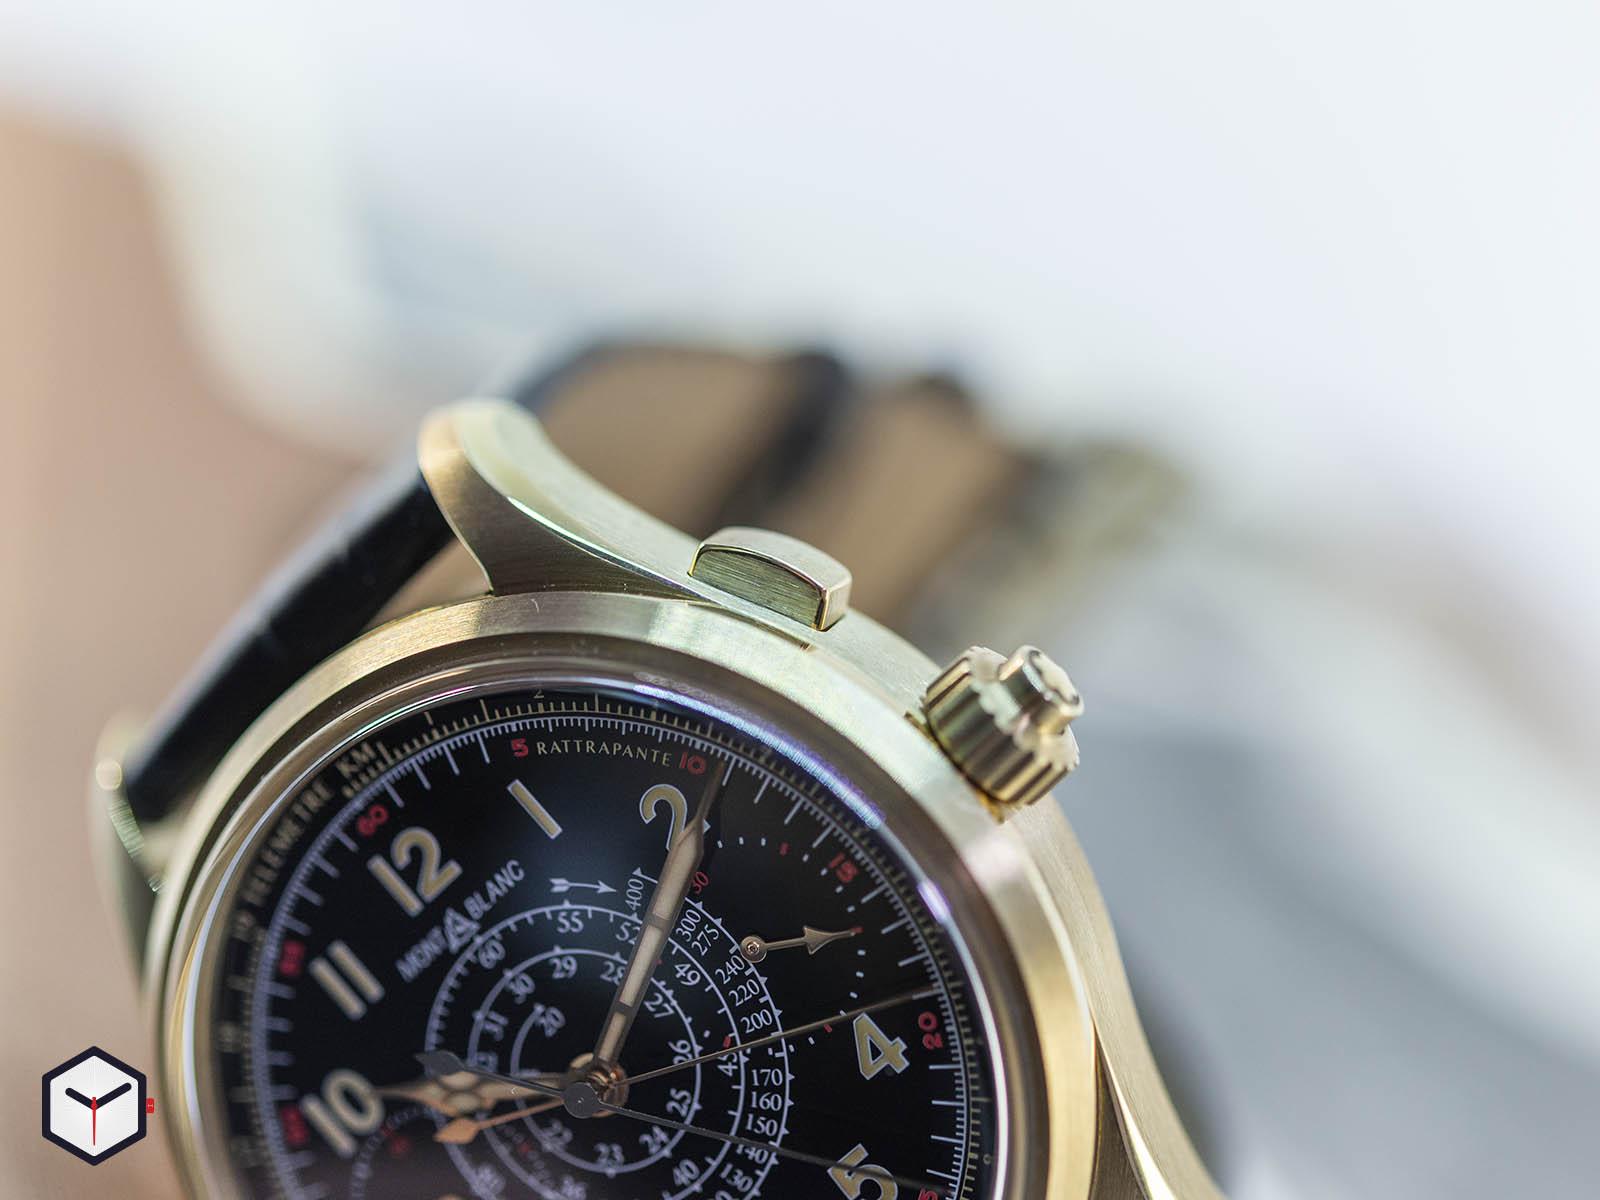 montblanc-1858-split-second-chronograph-3.jpg